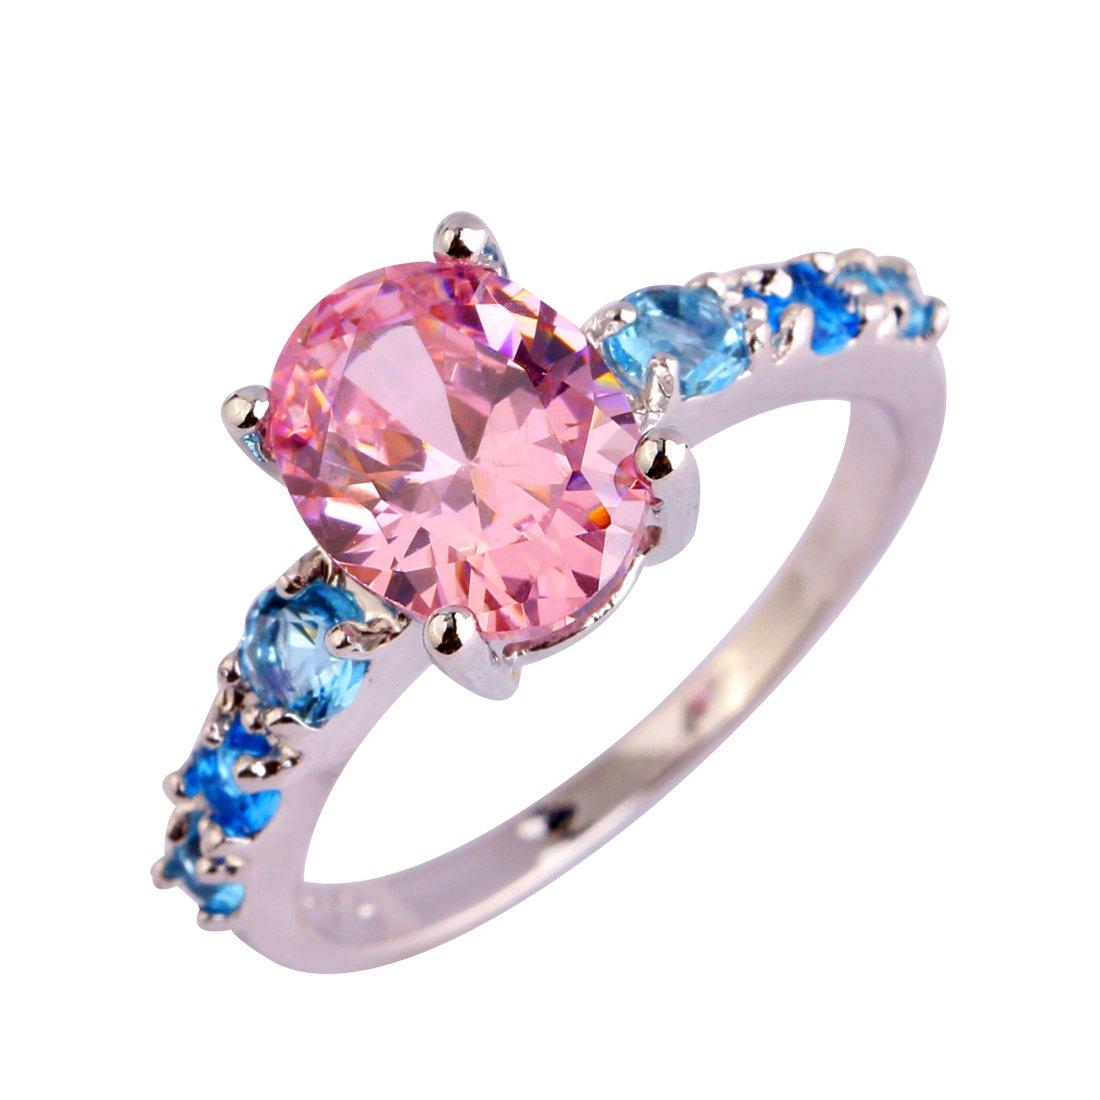 Amazon.com: LingMei 7mm9mm Oval Cut Created Pink Stone Women\'s Cz ...